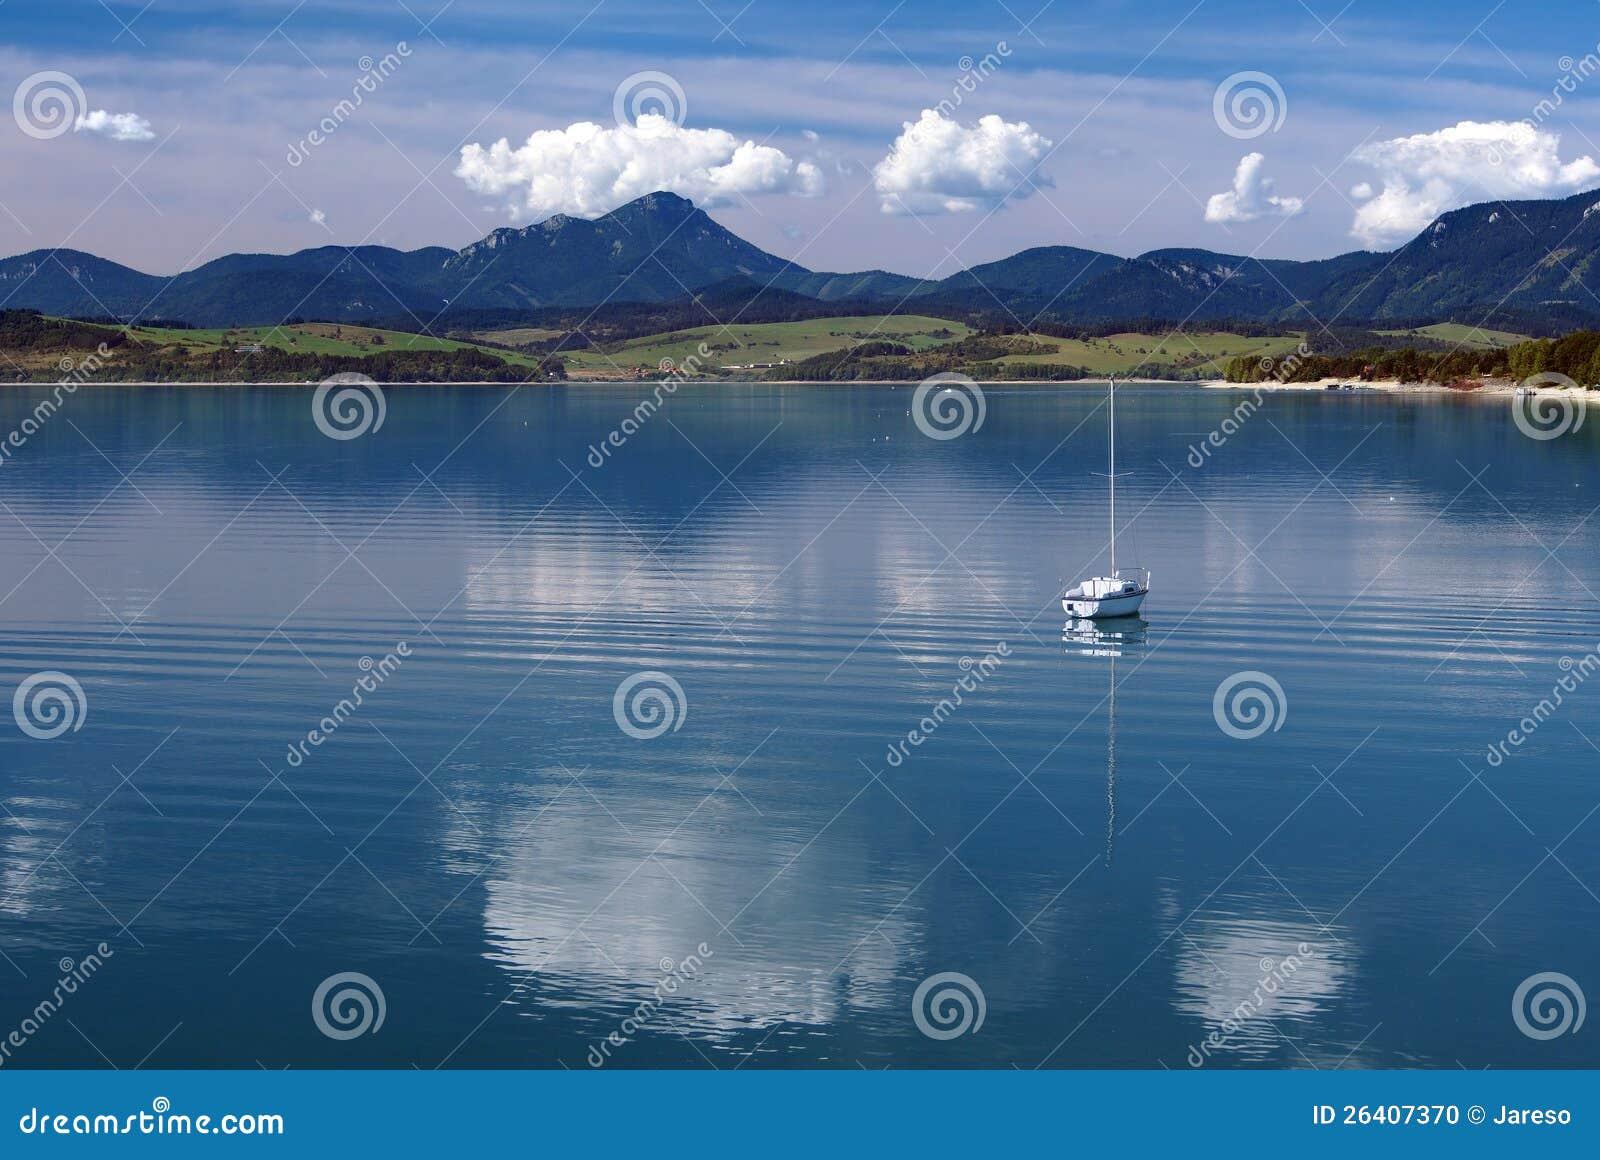 Deep waters of Liptovska Mara in summer